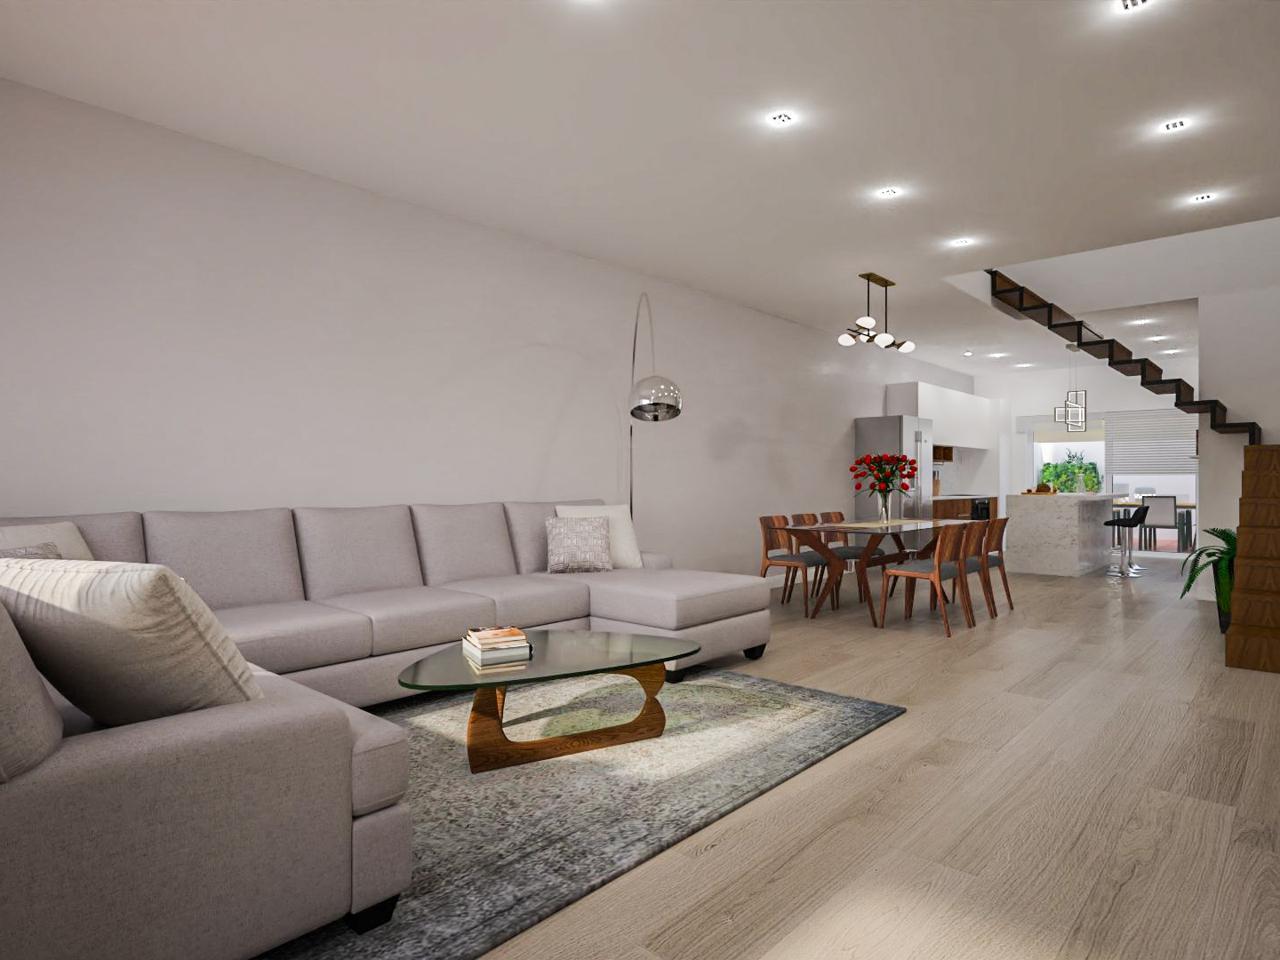 villa en montornes-del-valles · carrer-major-08170 199000€